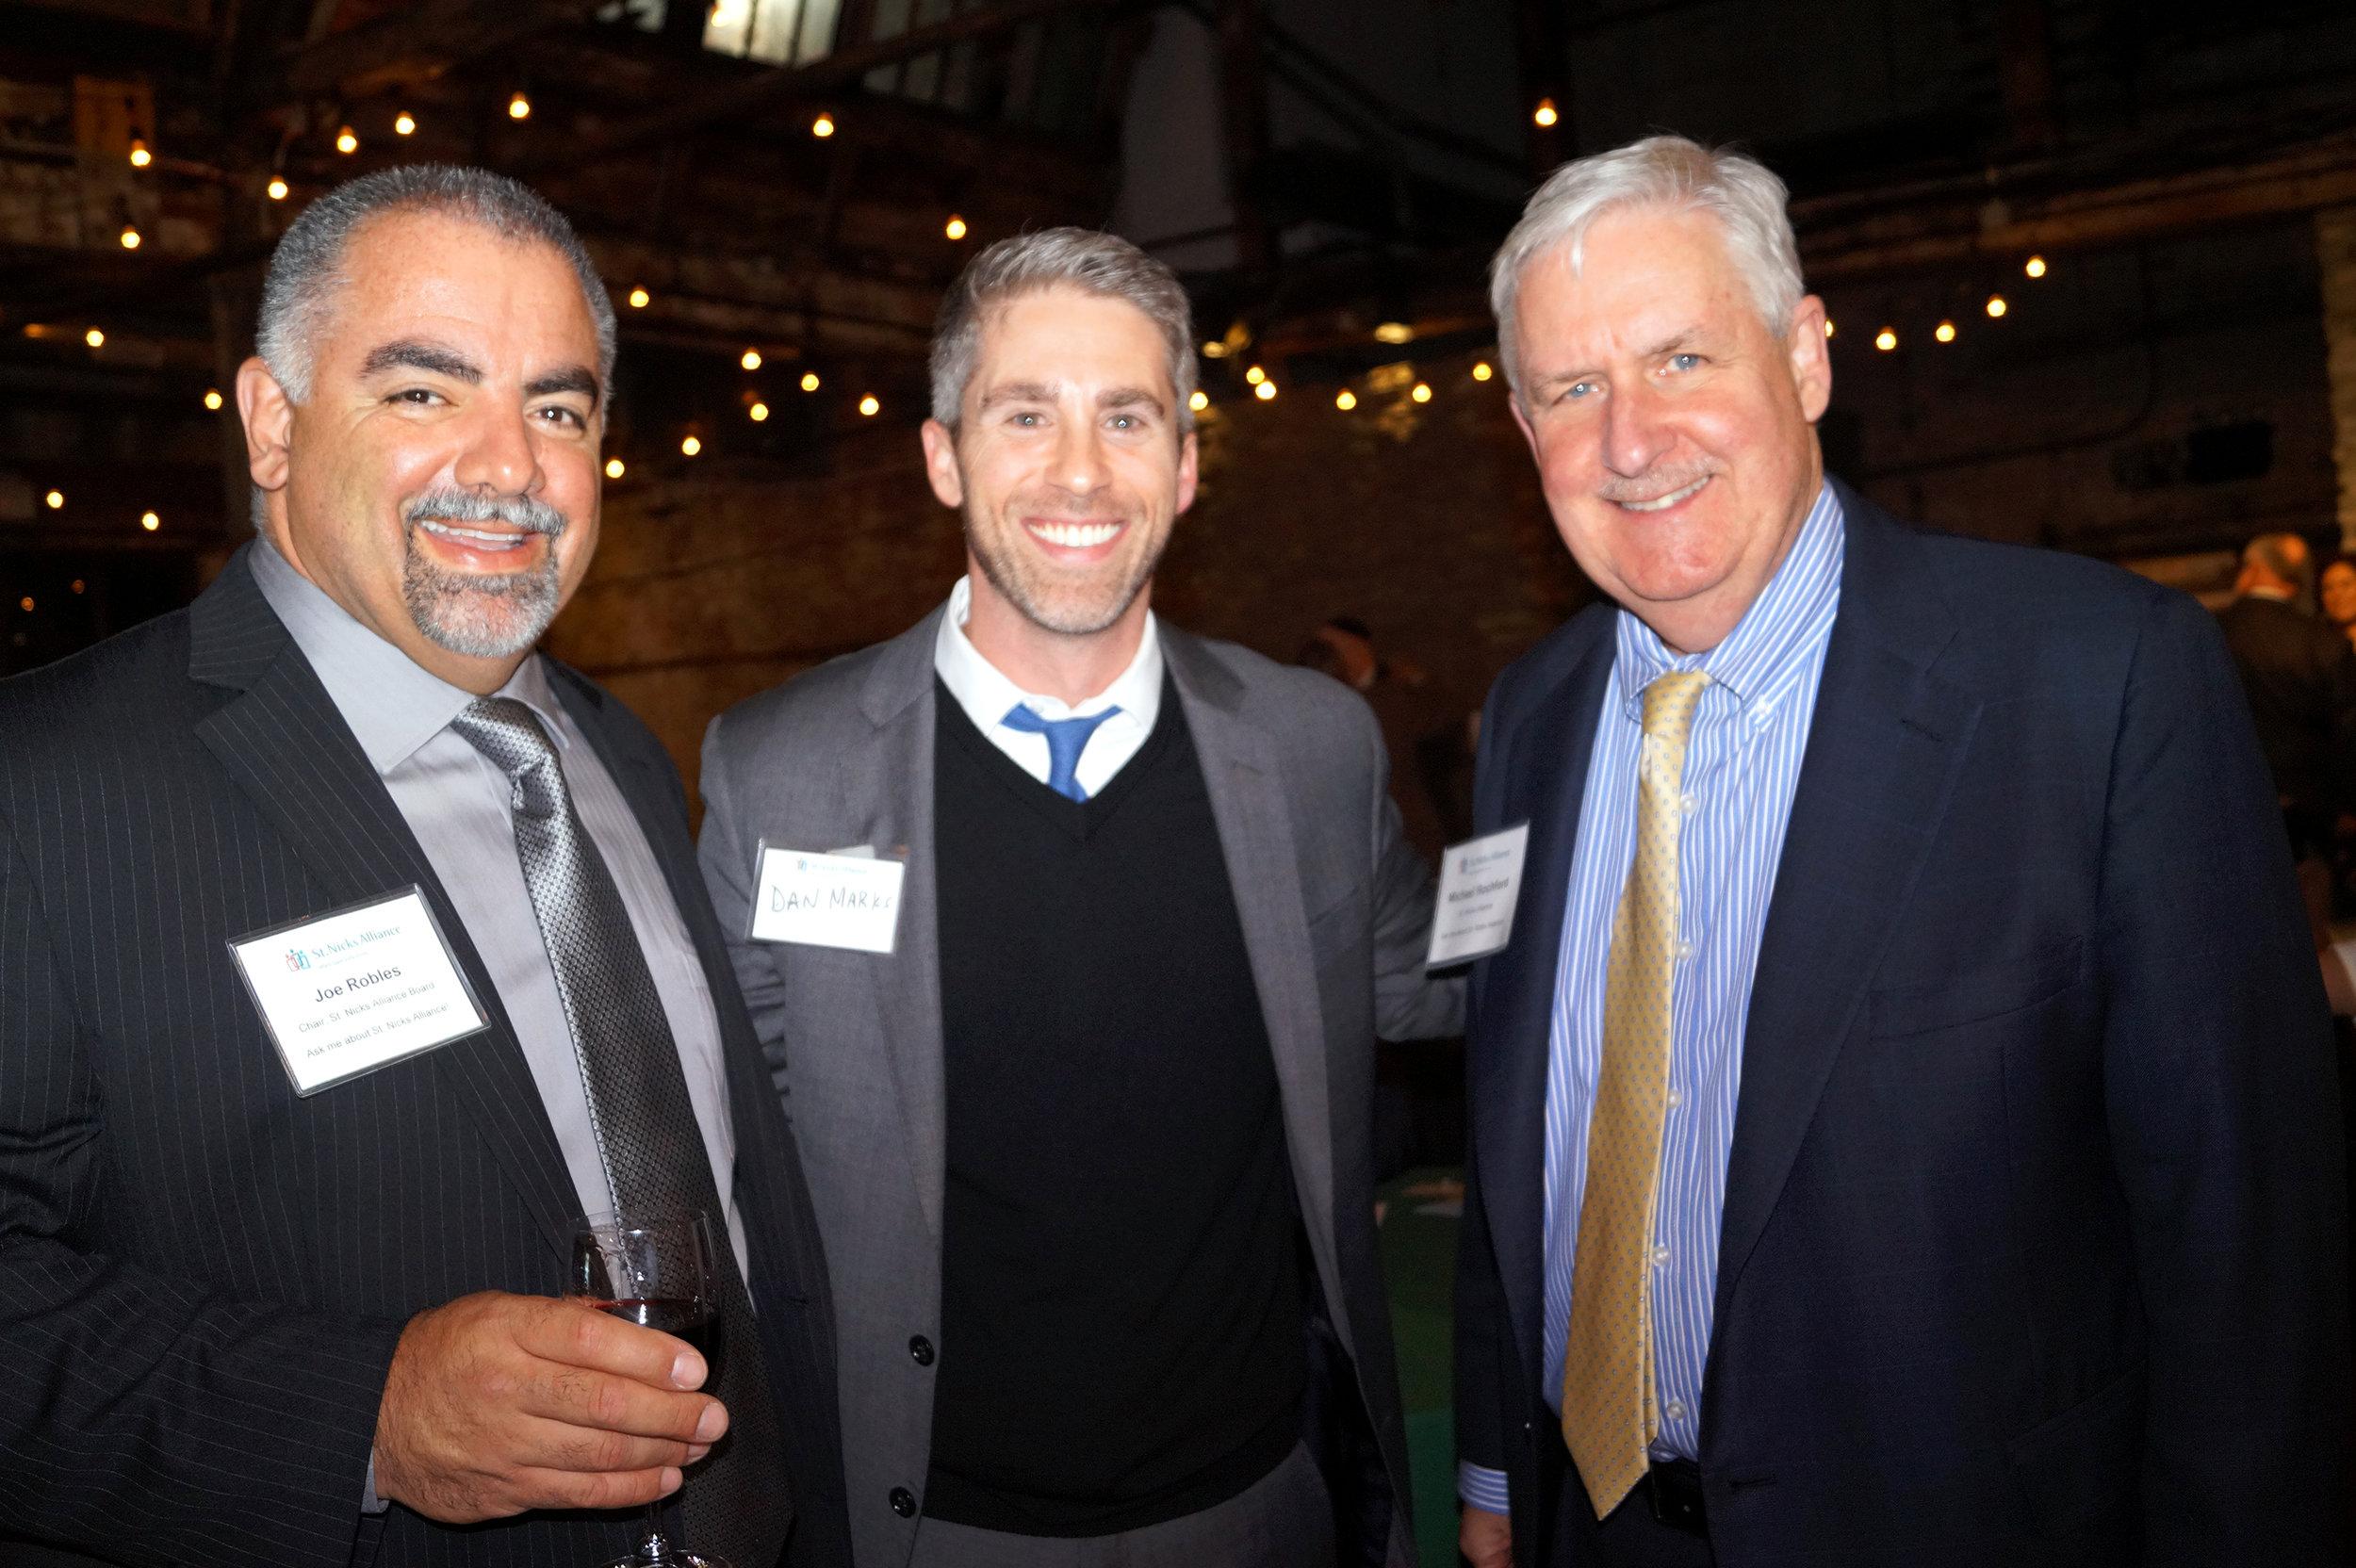 Joe Robles (St. Nicks Alliance Board Chair), Dan Marks, Michael Rochford (St. Nicks Alliance Exec. Dir.)